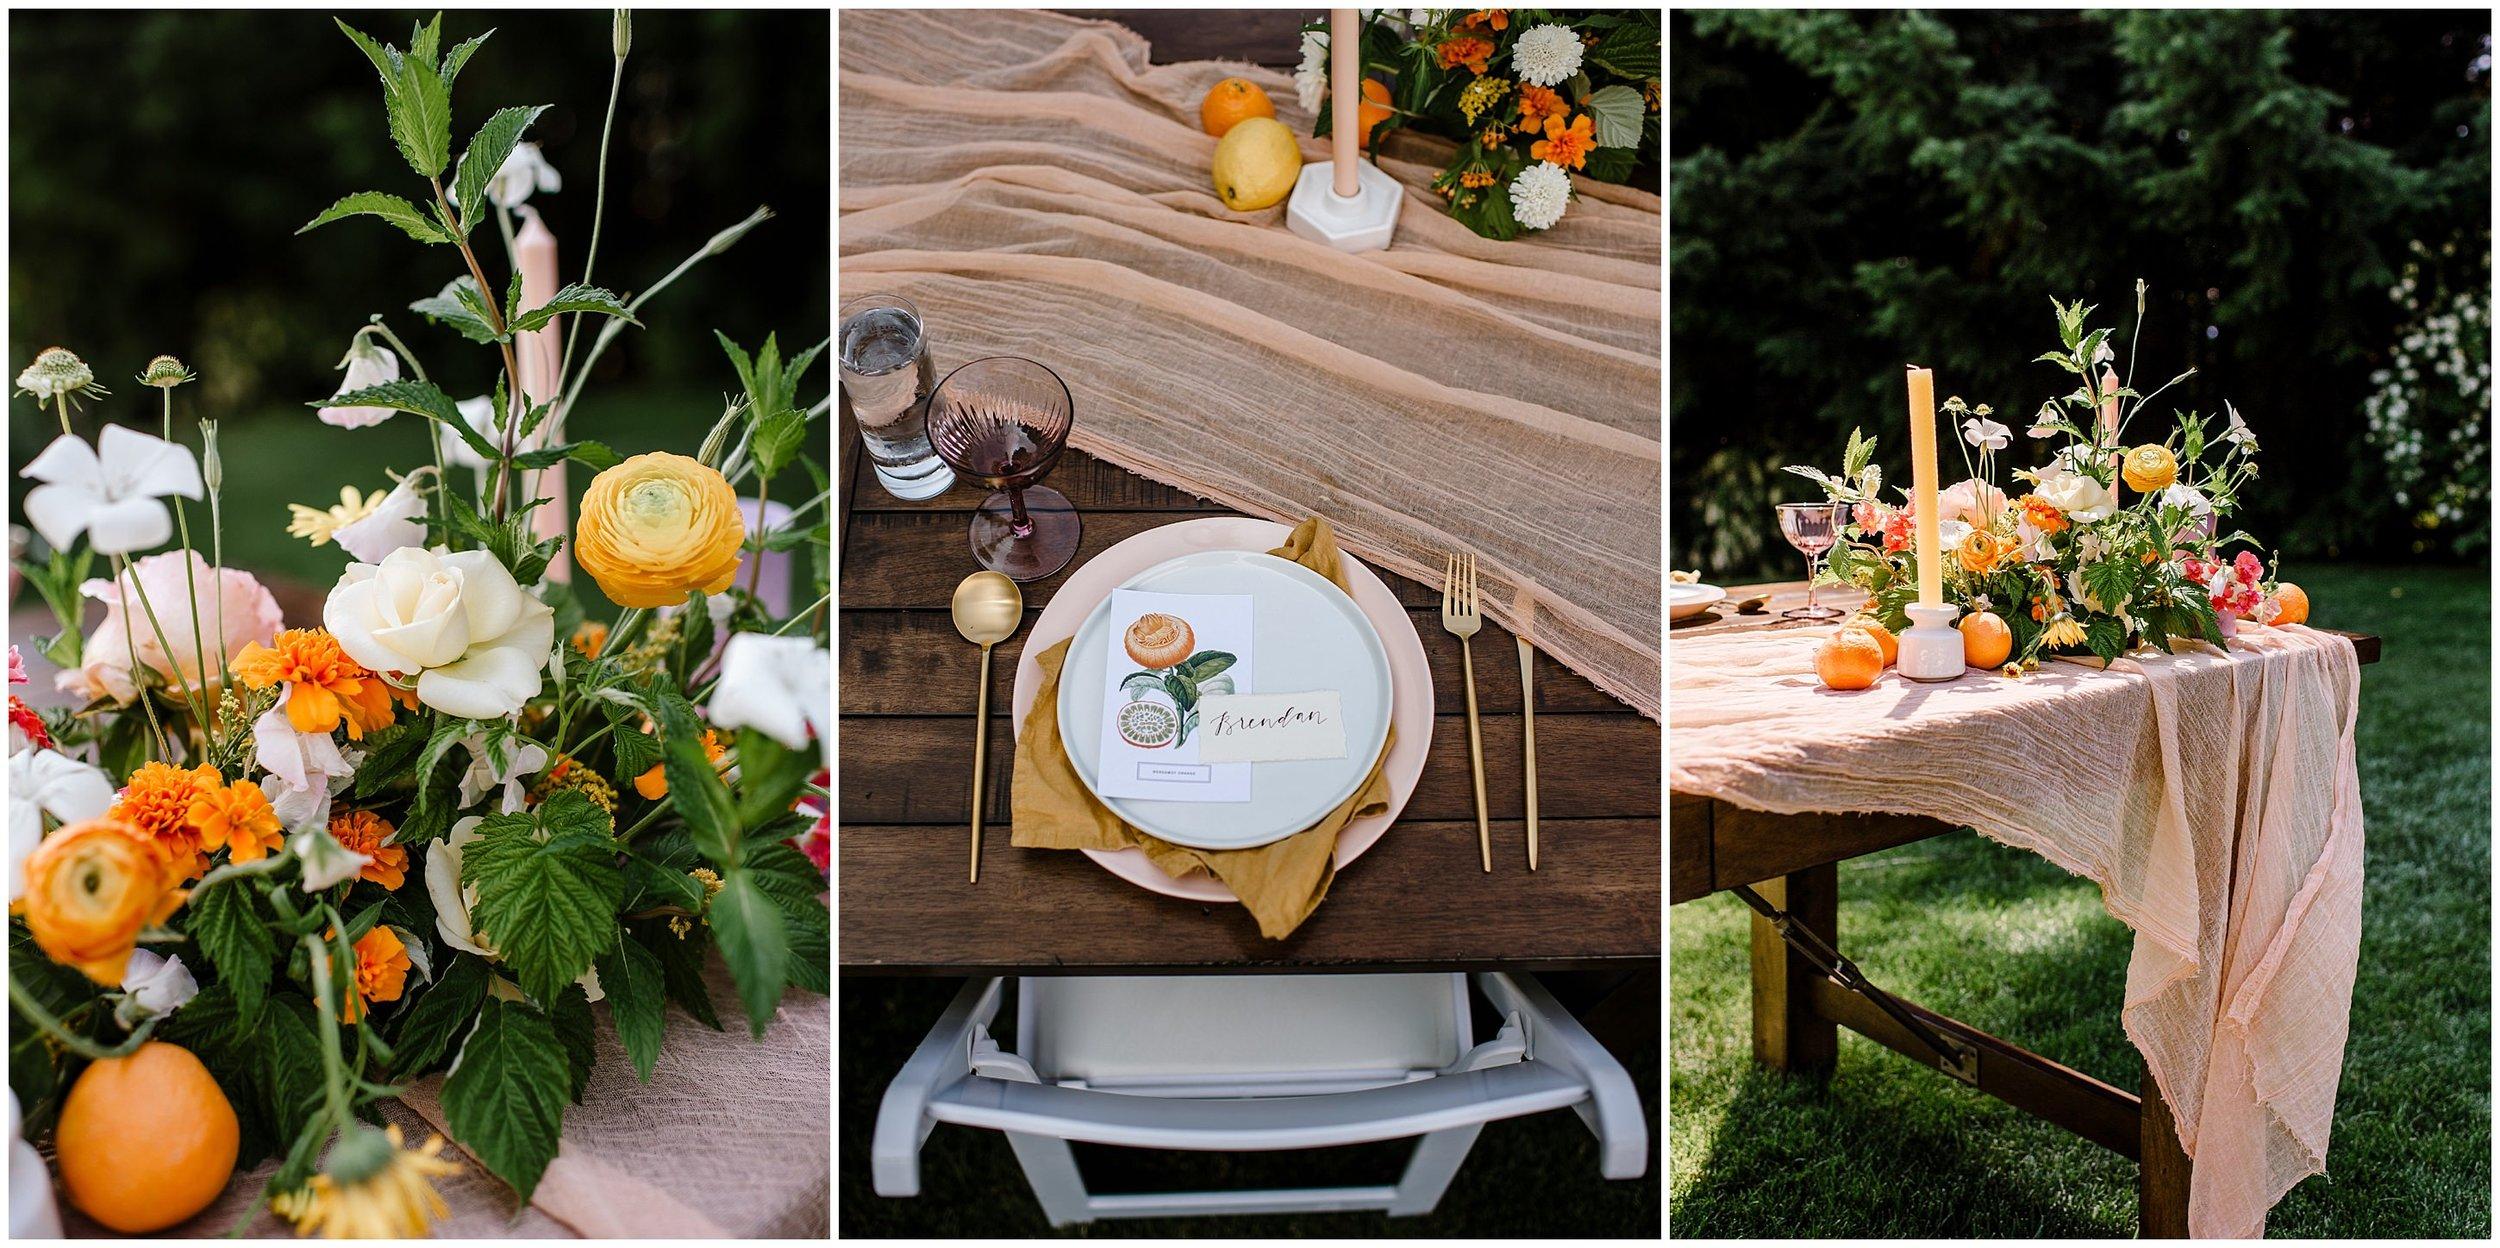 Citrus-inspired-wedding-at-Gorge-Crest-Vineyard-216.jpg